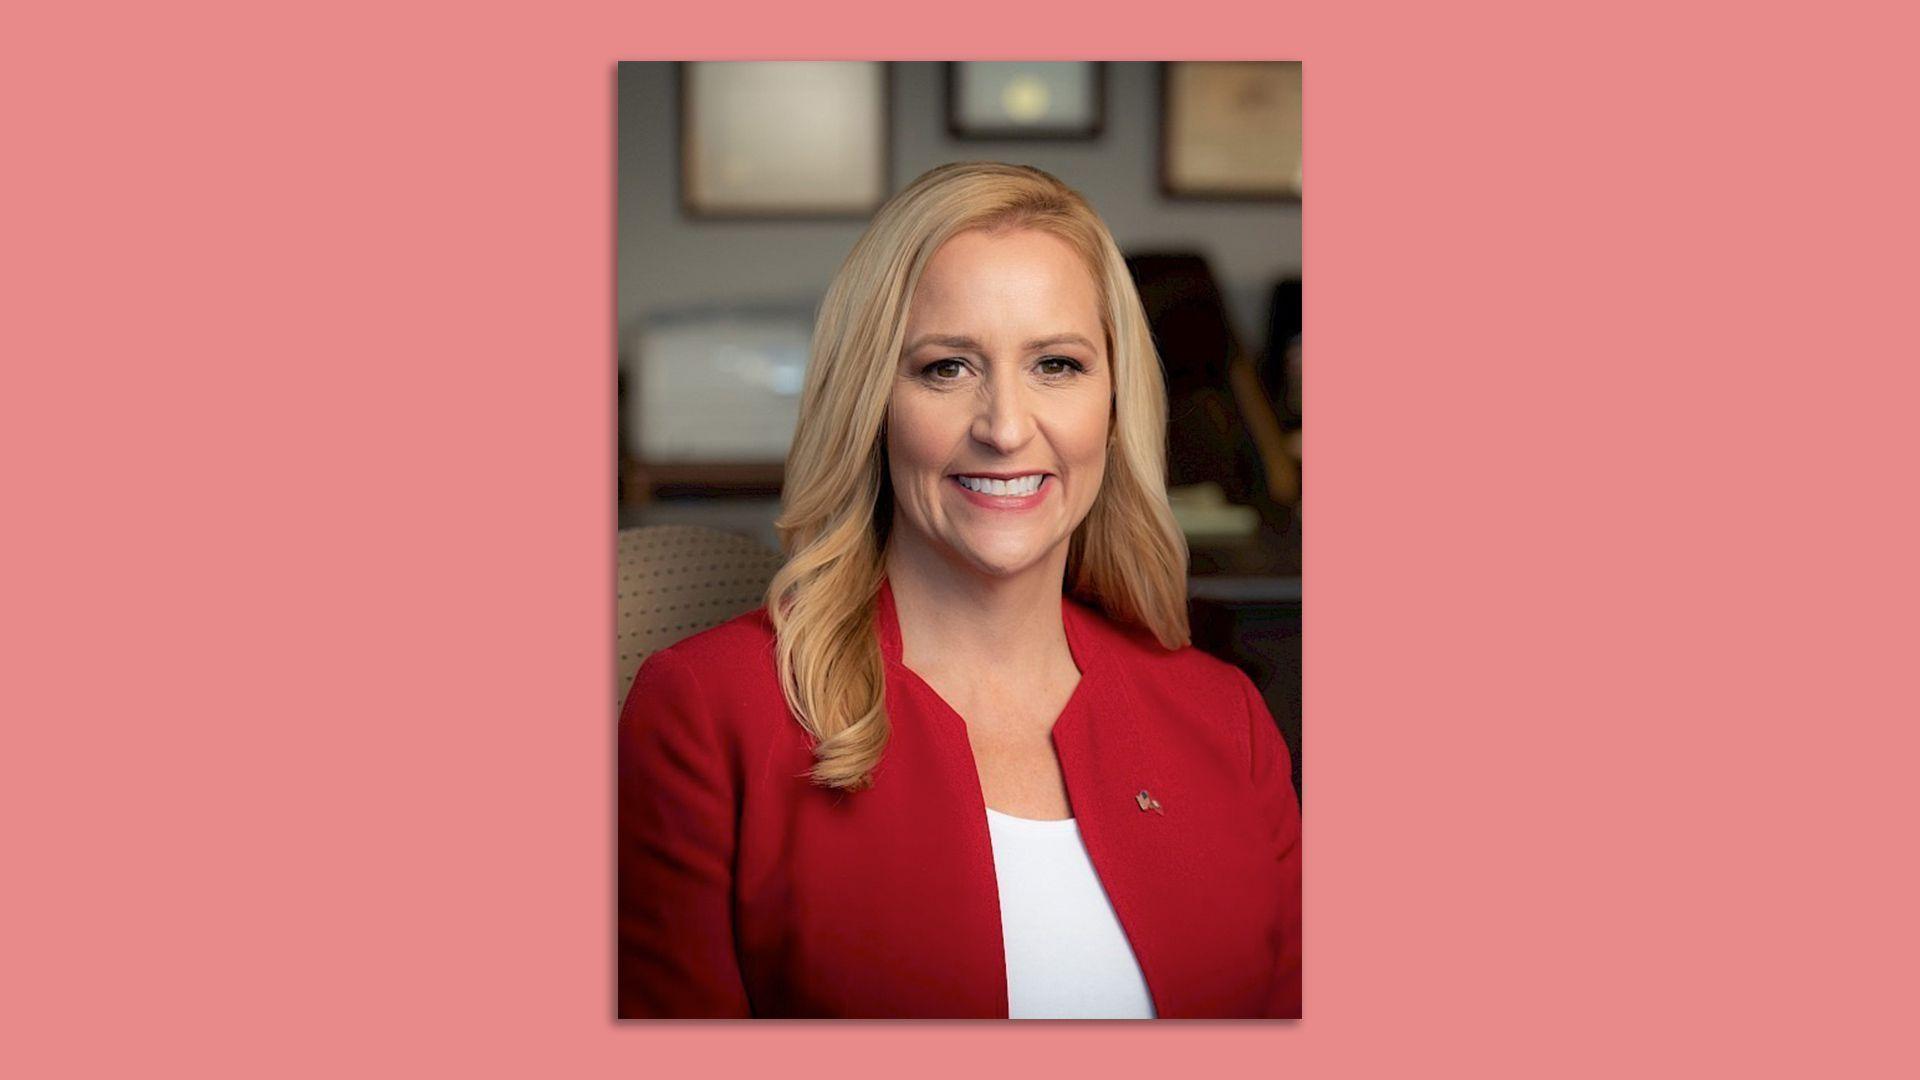 A headshot of Arkansas Attorney General Leslie Rutledge